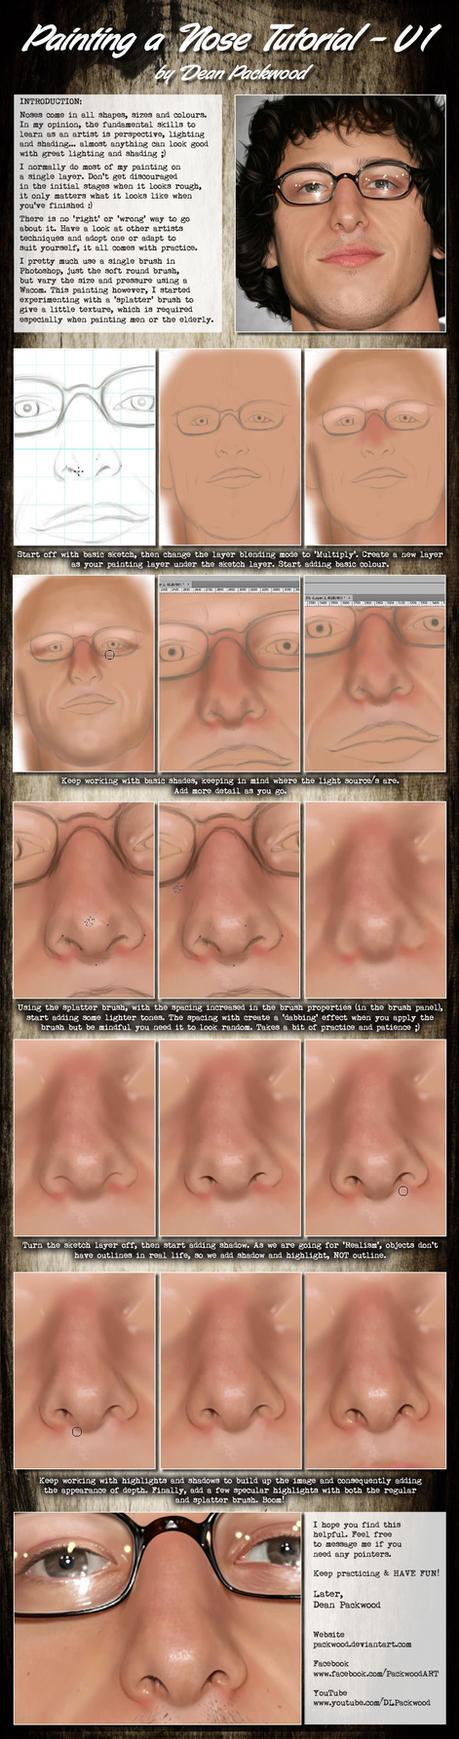 Nose Tutorial - V1 by Packwood